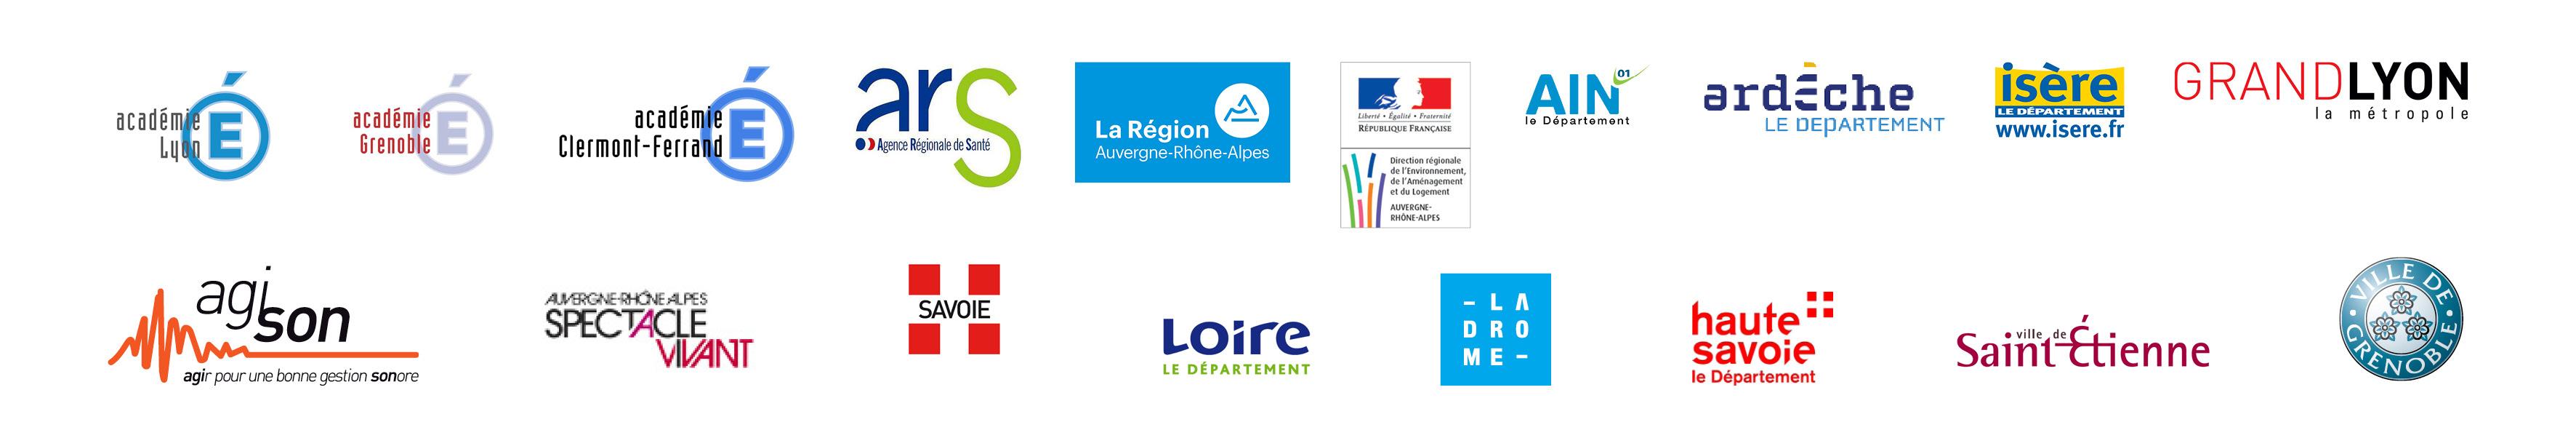 logos des partenaires dose le son